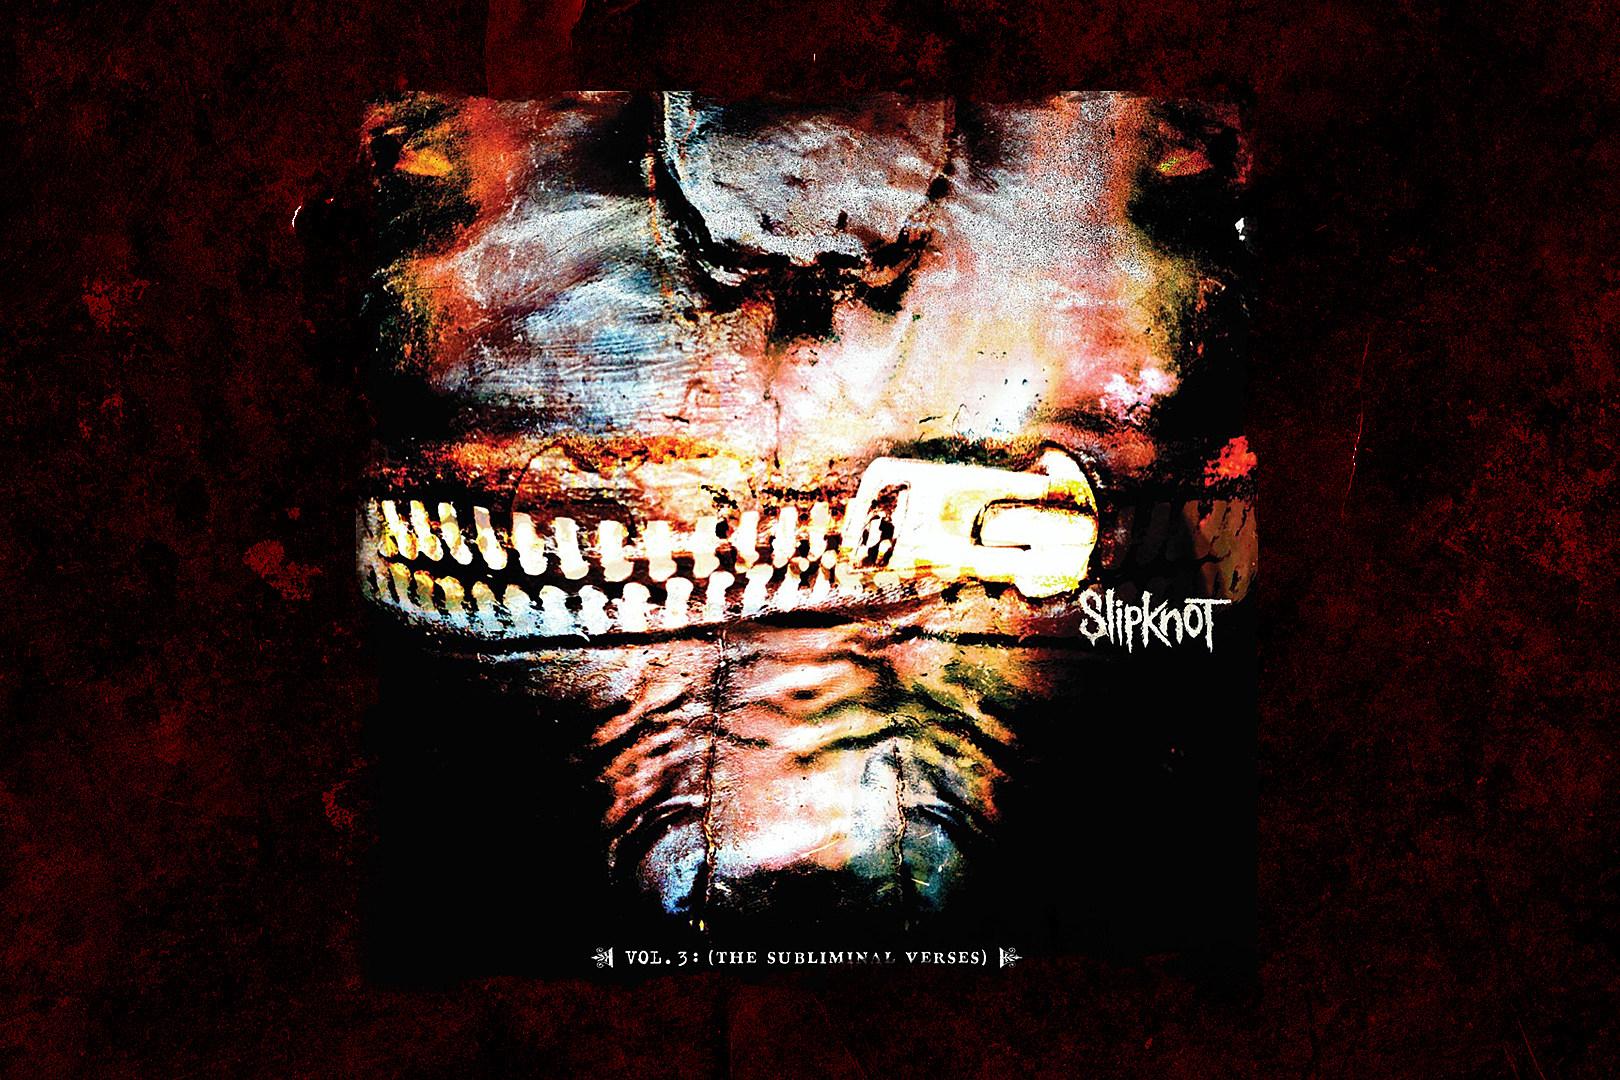 16 Years Ago: Slipknot Unleash 'Vol. 3: The Subliminal Verses'